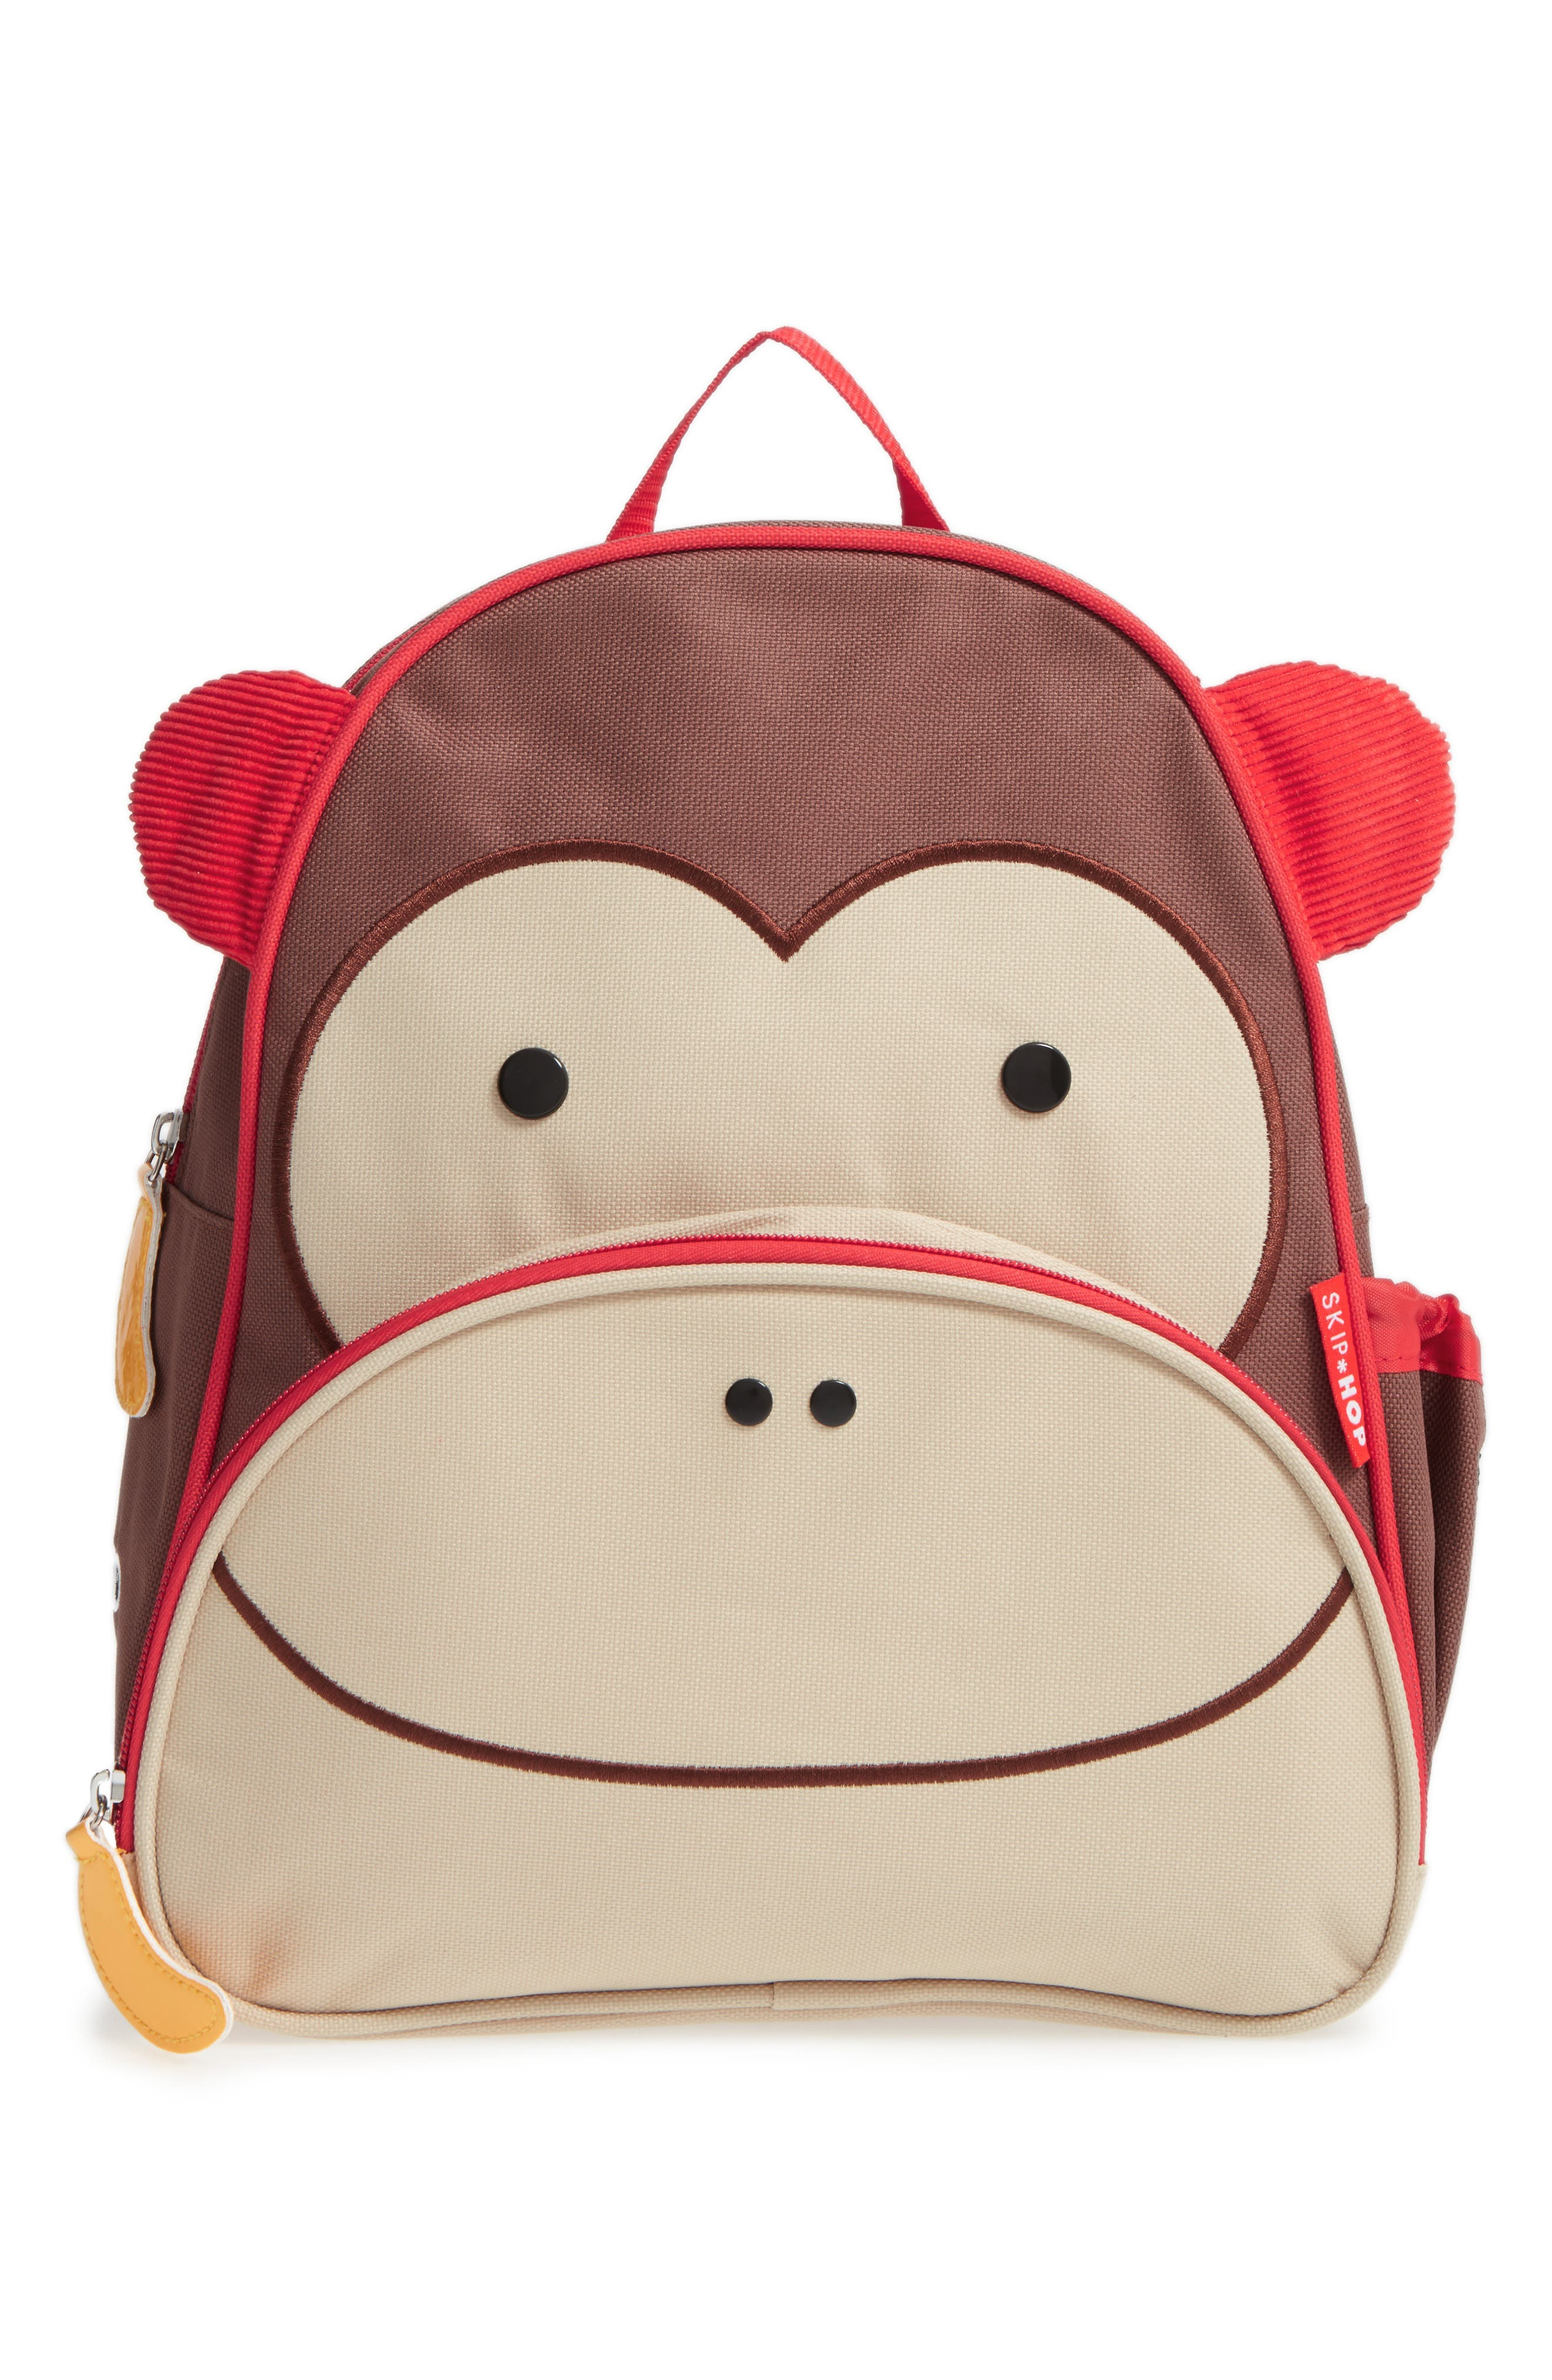 SKIP HOP Monkey Zoo Pack Backpack, Main, color, BROWN